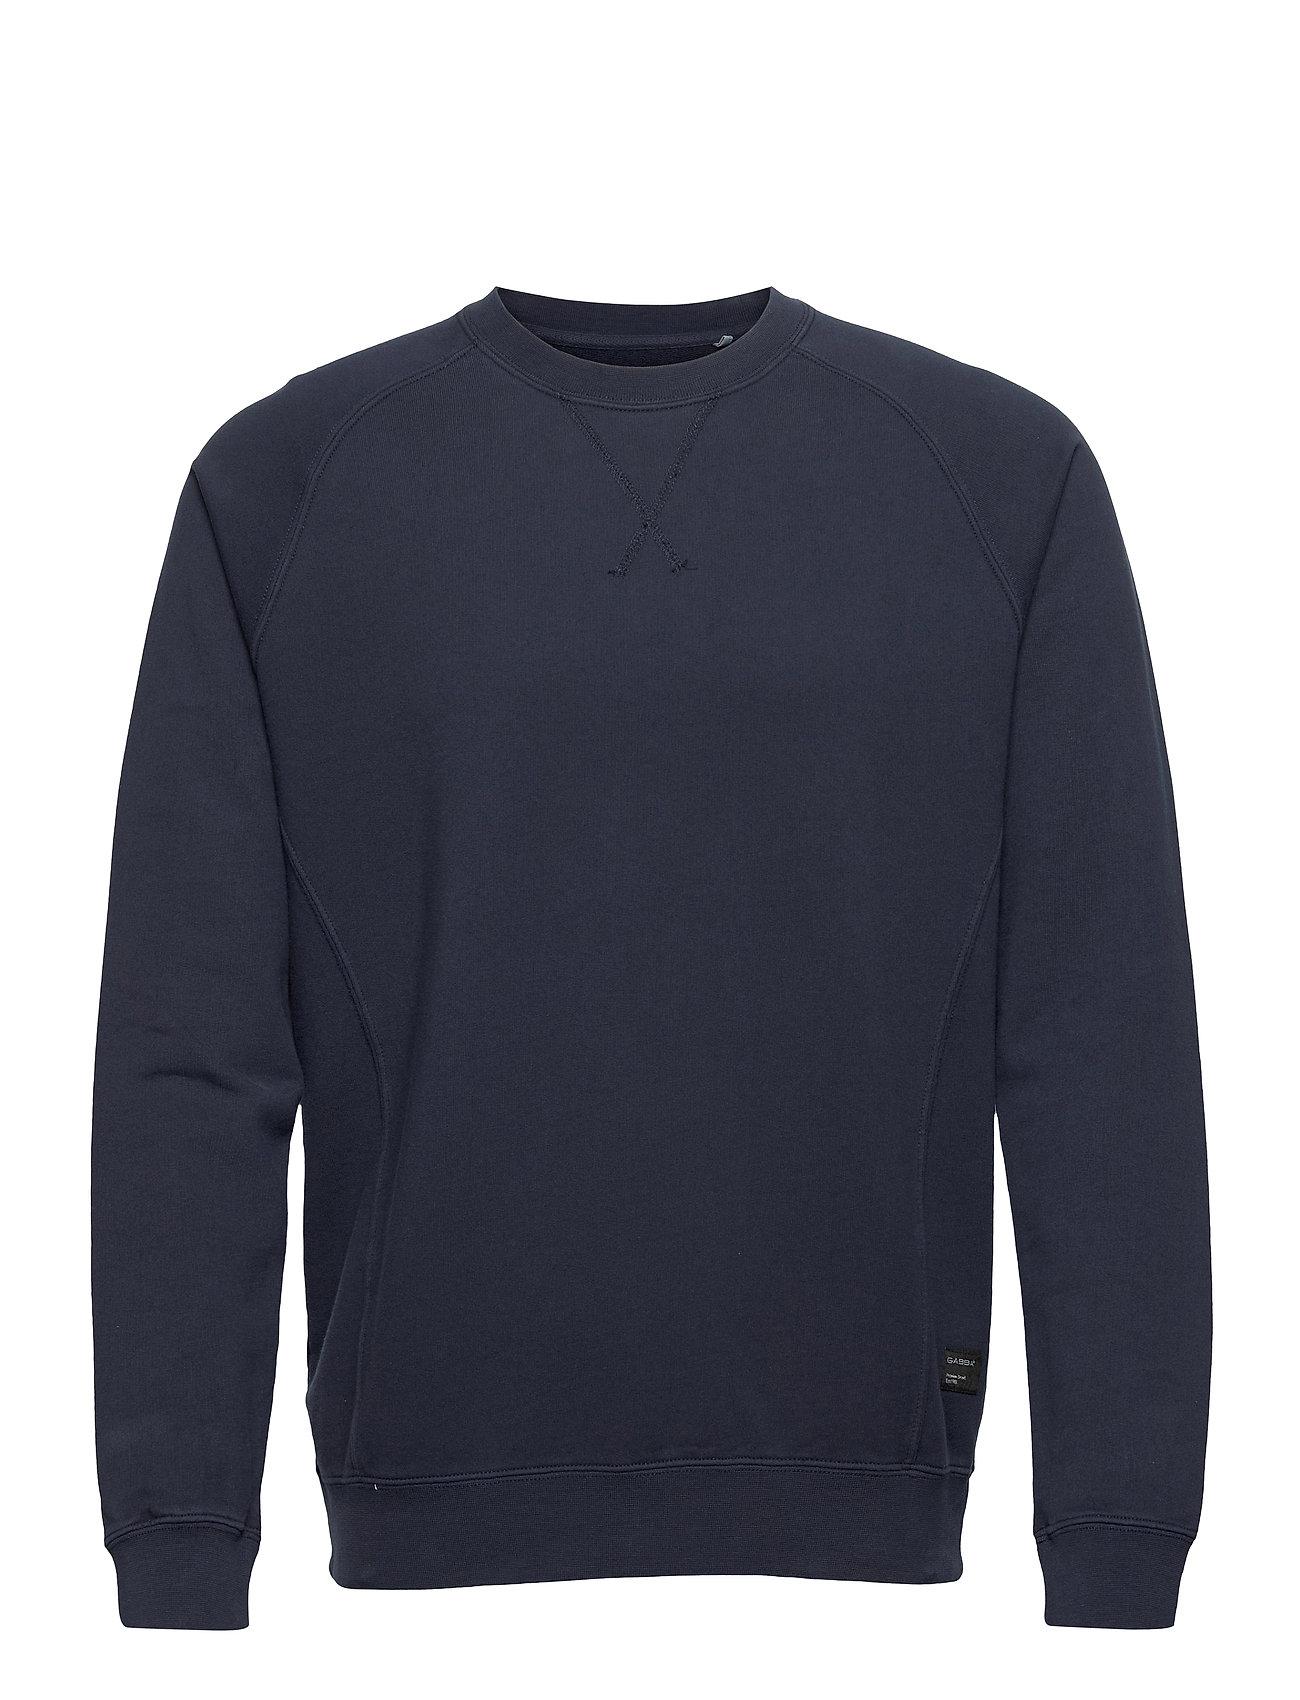 Image of Nine Crew Neck Sweat Sweatshirt Trøje Blå Gabba (3501119541)